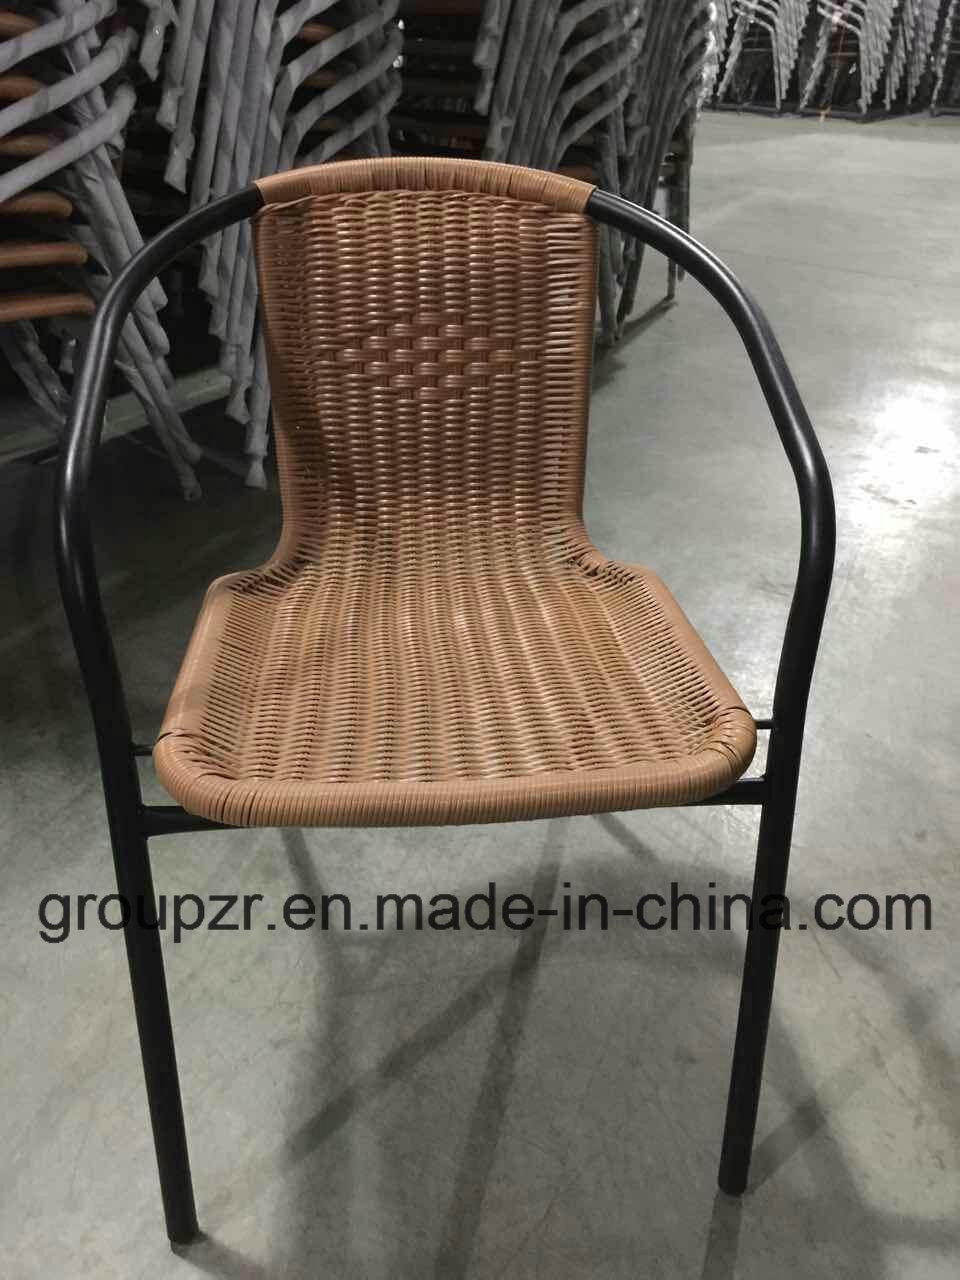 China Steel PE Rattan Chair Outdoor Wicker Furniture - China Steel ...